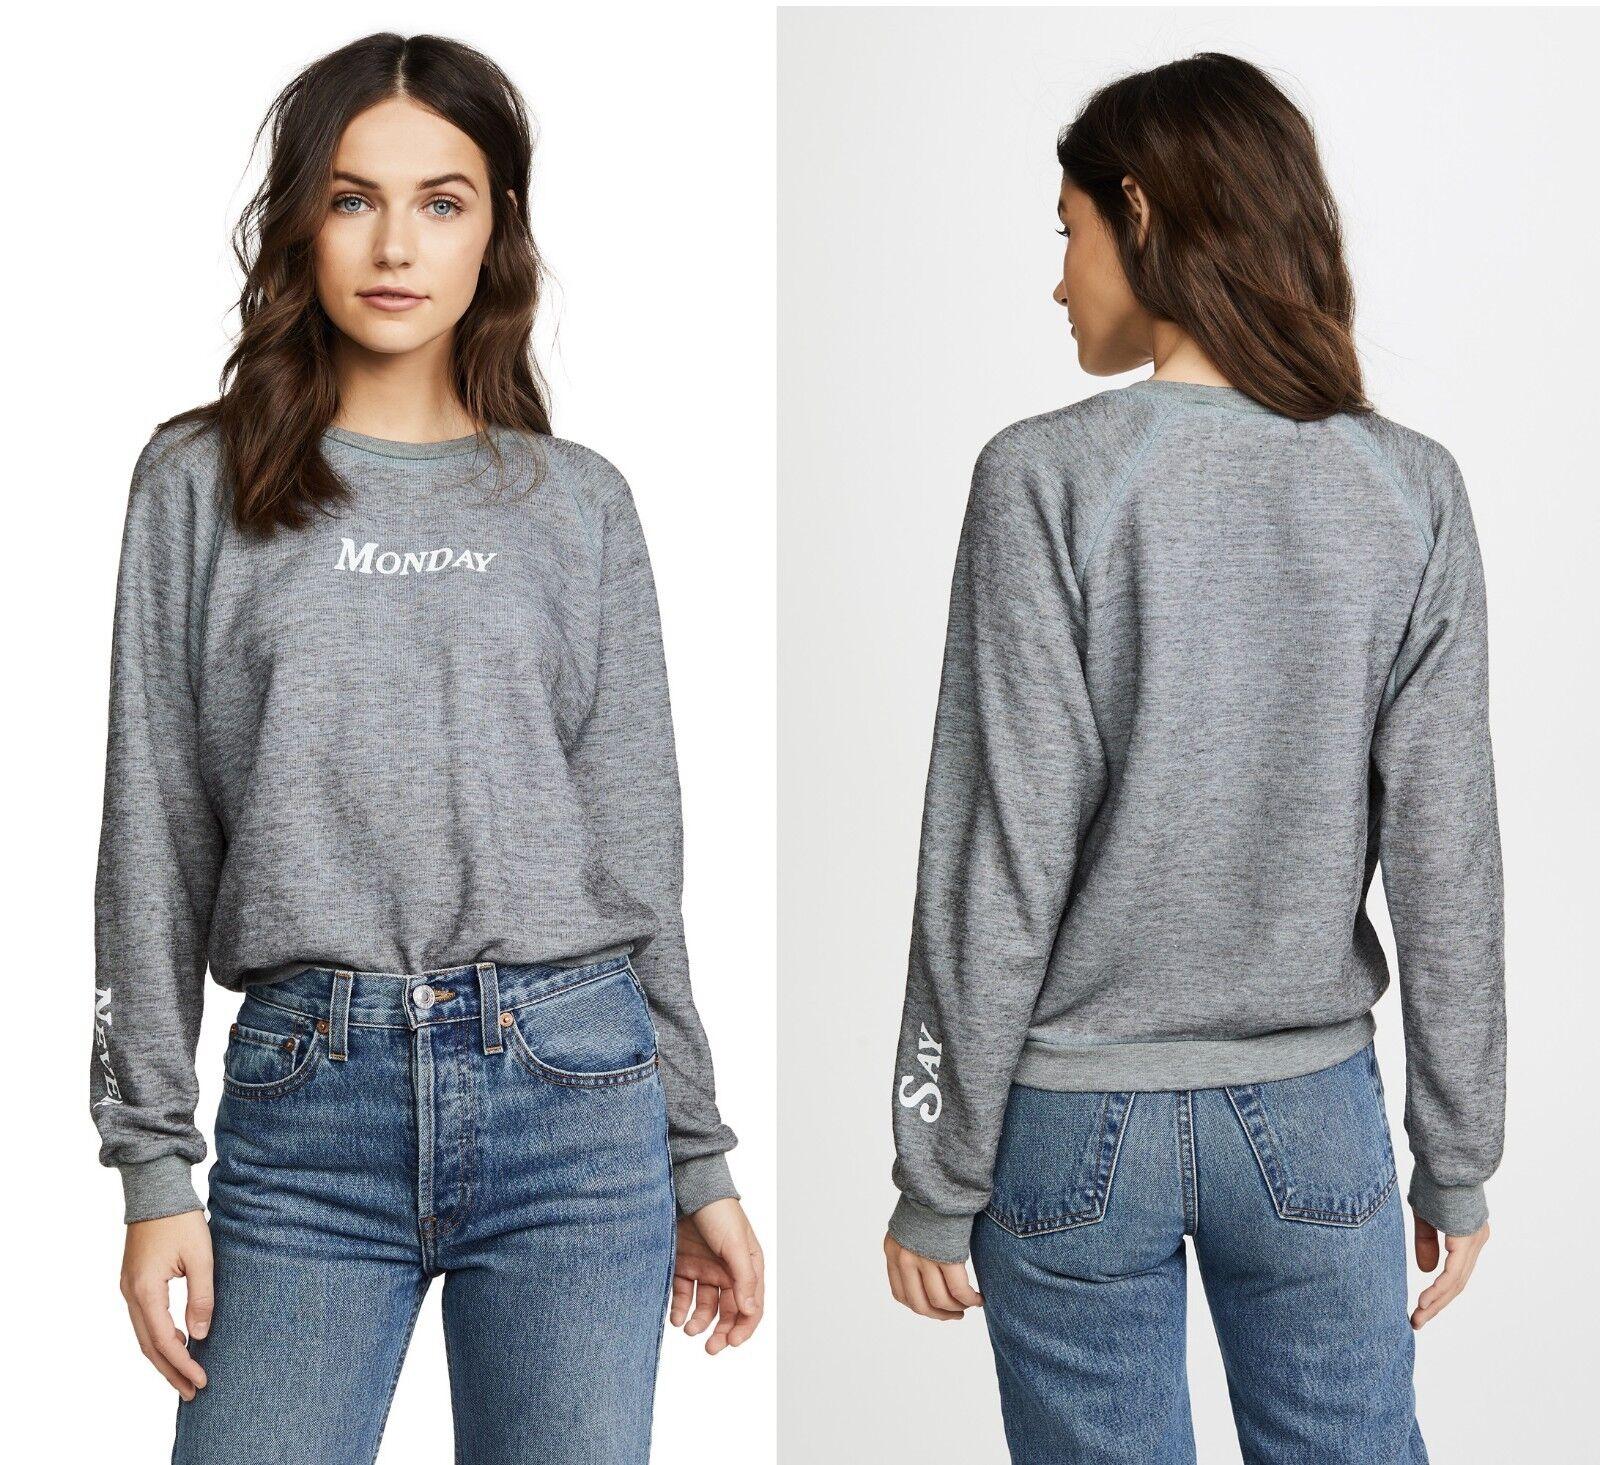 Wildfox Couture Women's Never Say Monday Sweater fleece sweatshirt Tshirt Top